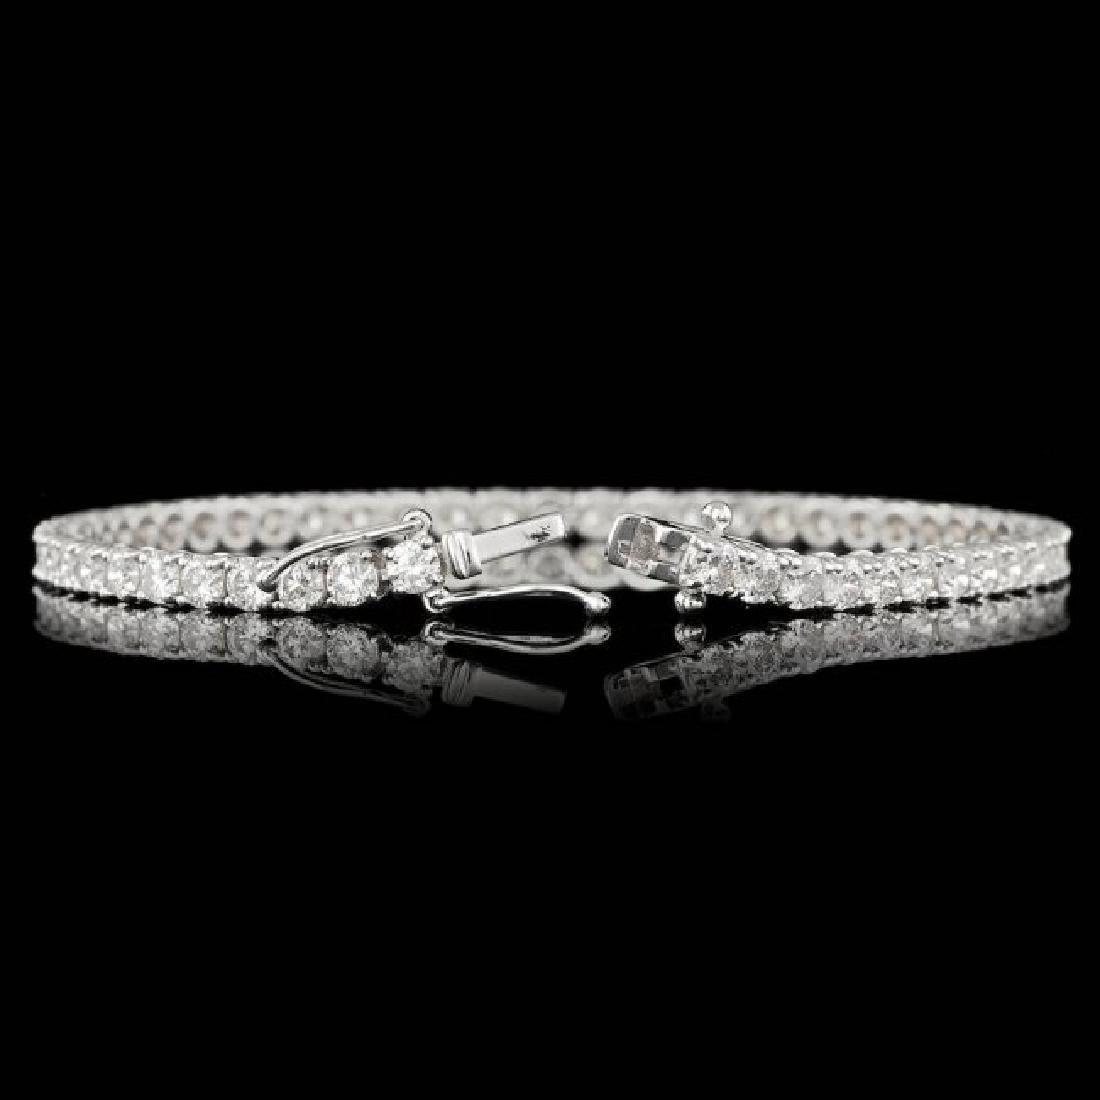 18k White Gold 6.55ct Diamond Bracelet - 2